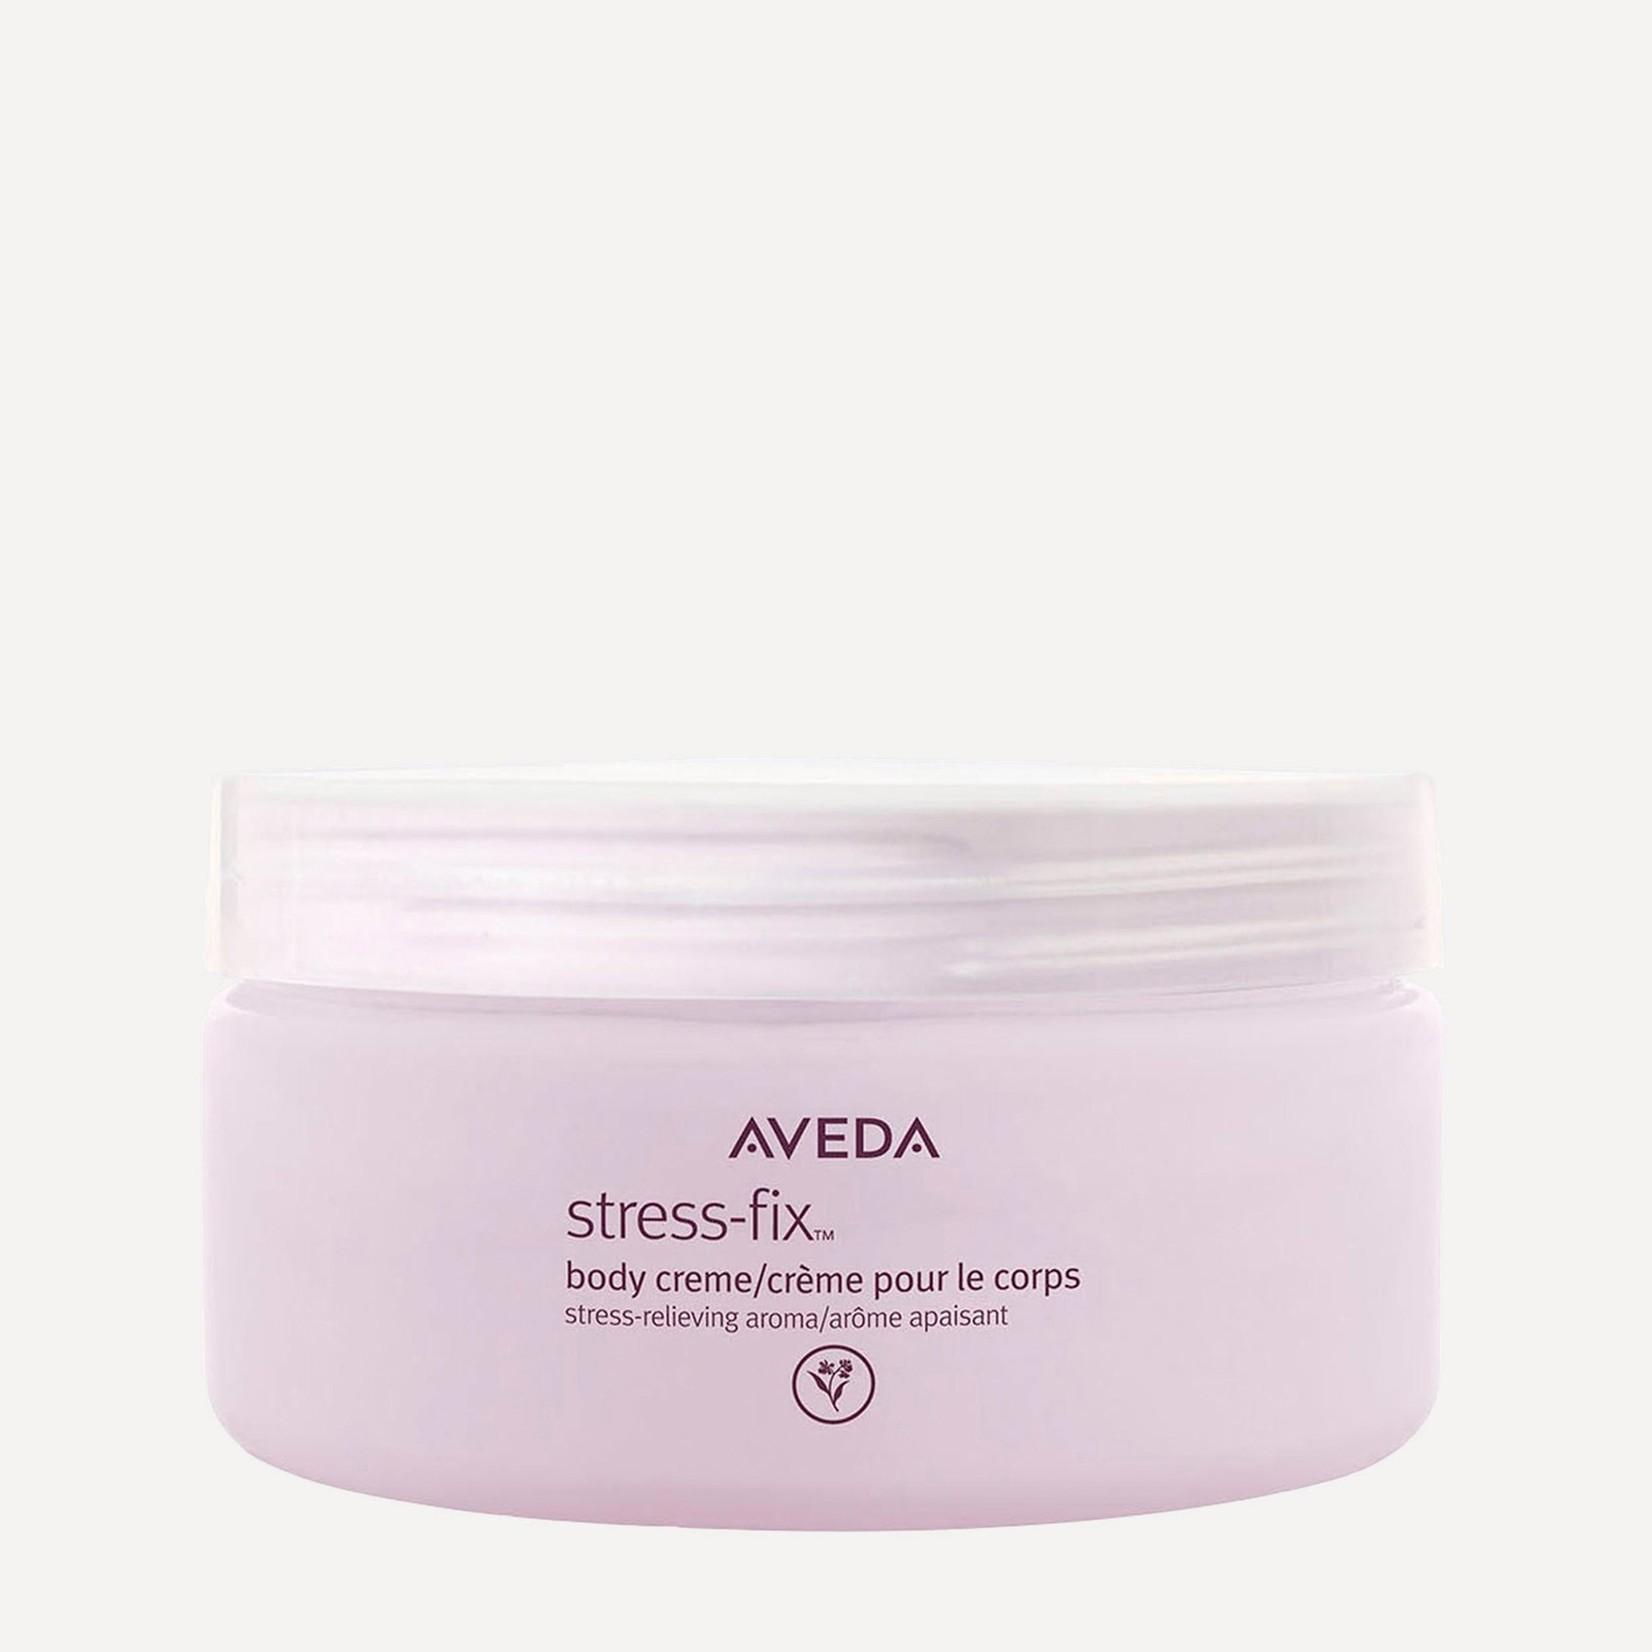 AVEDA Stress-fix™ Body Creme